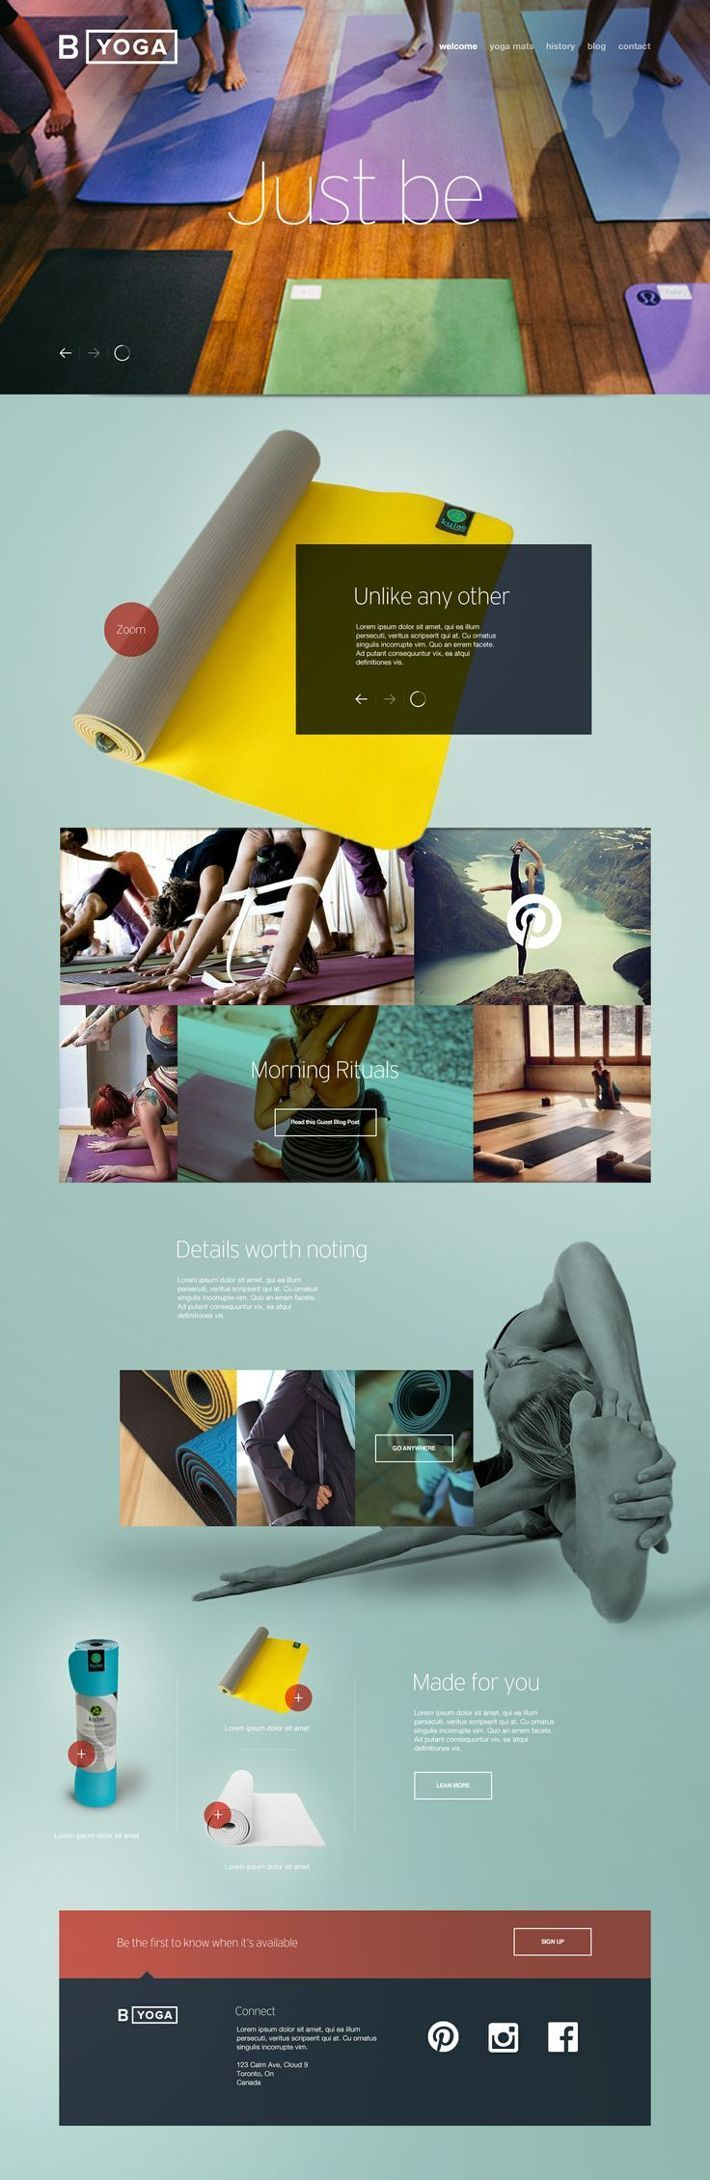 (2) B Yoga Website Design Concept   Interactive / UI   Pinterest